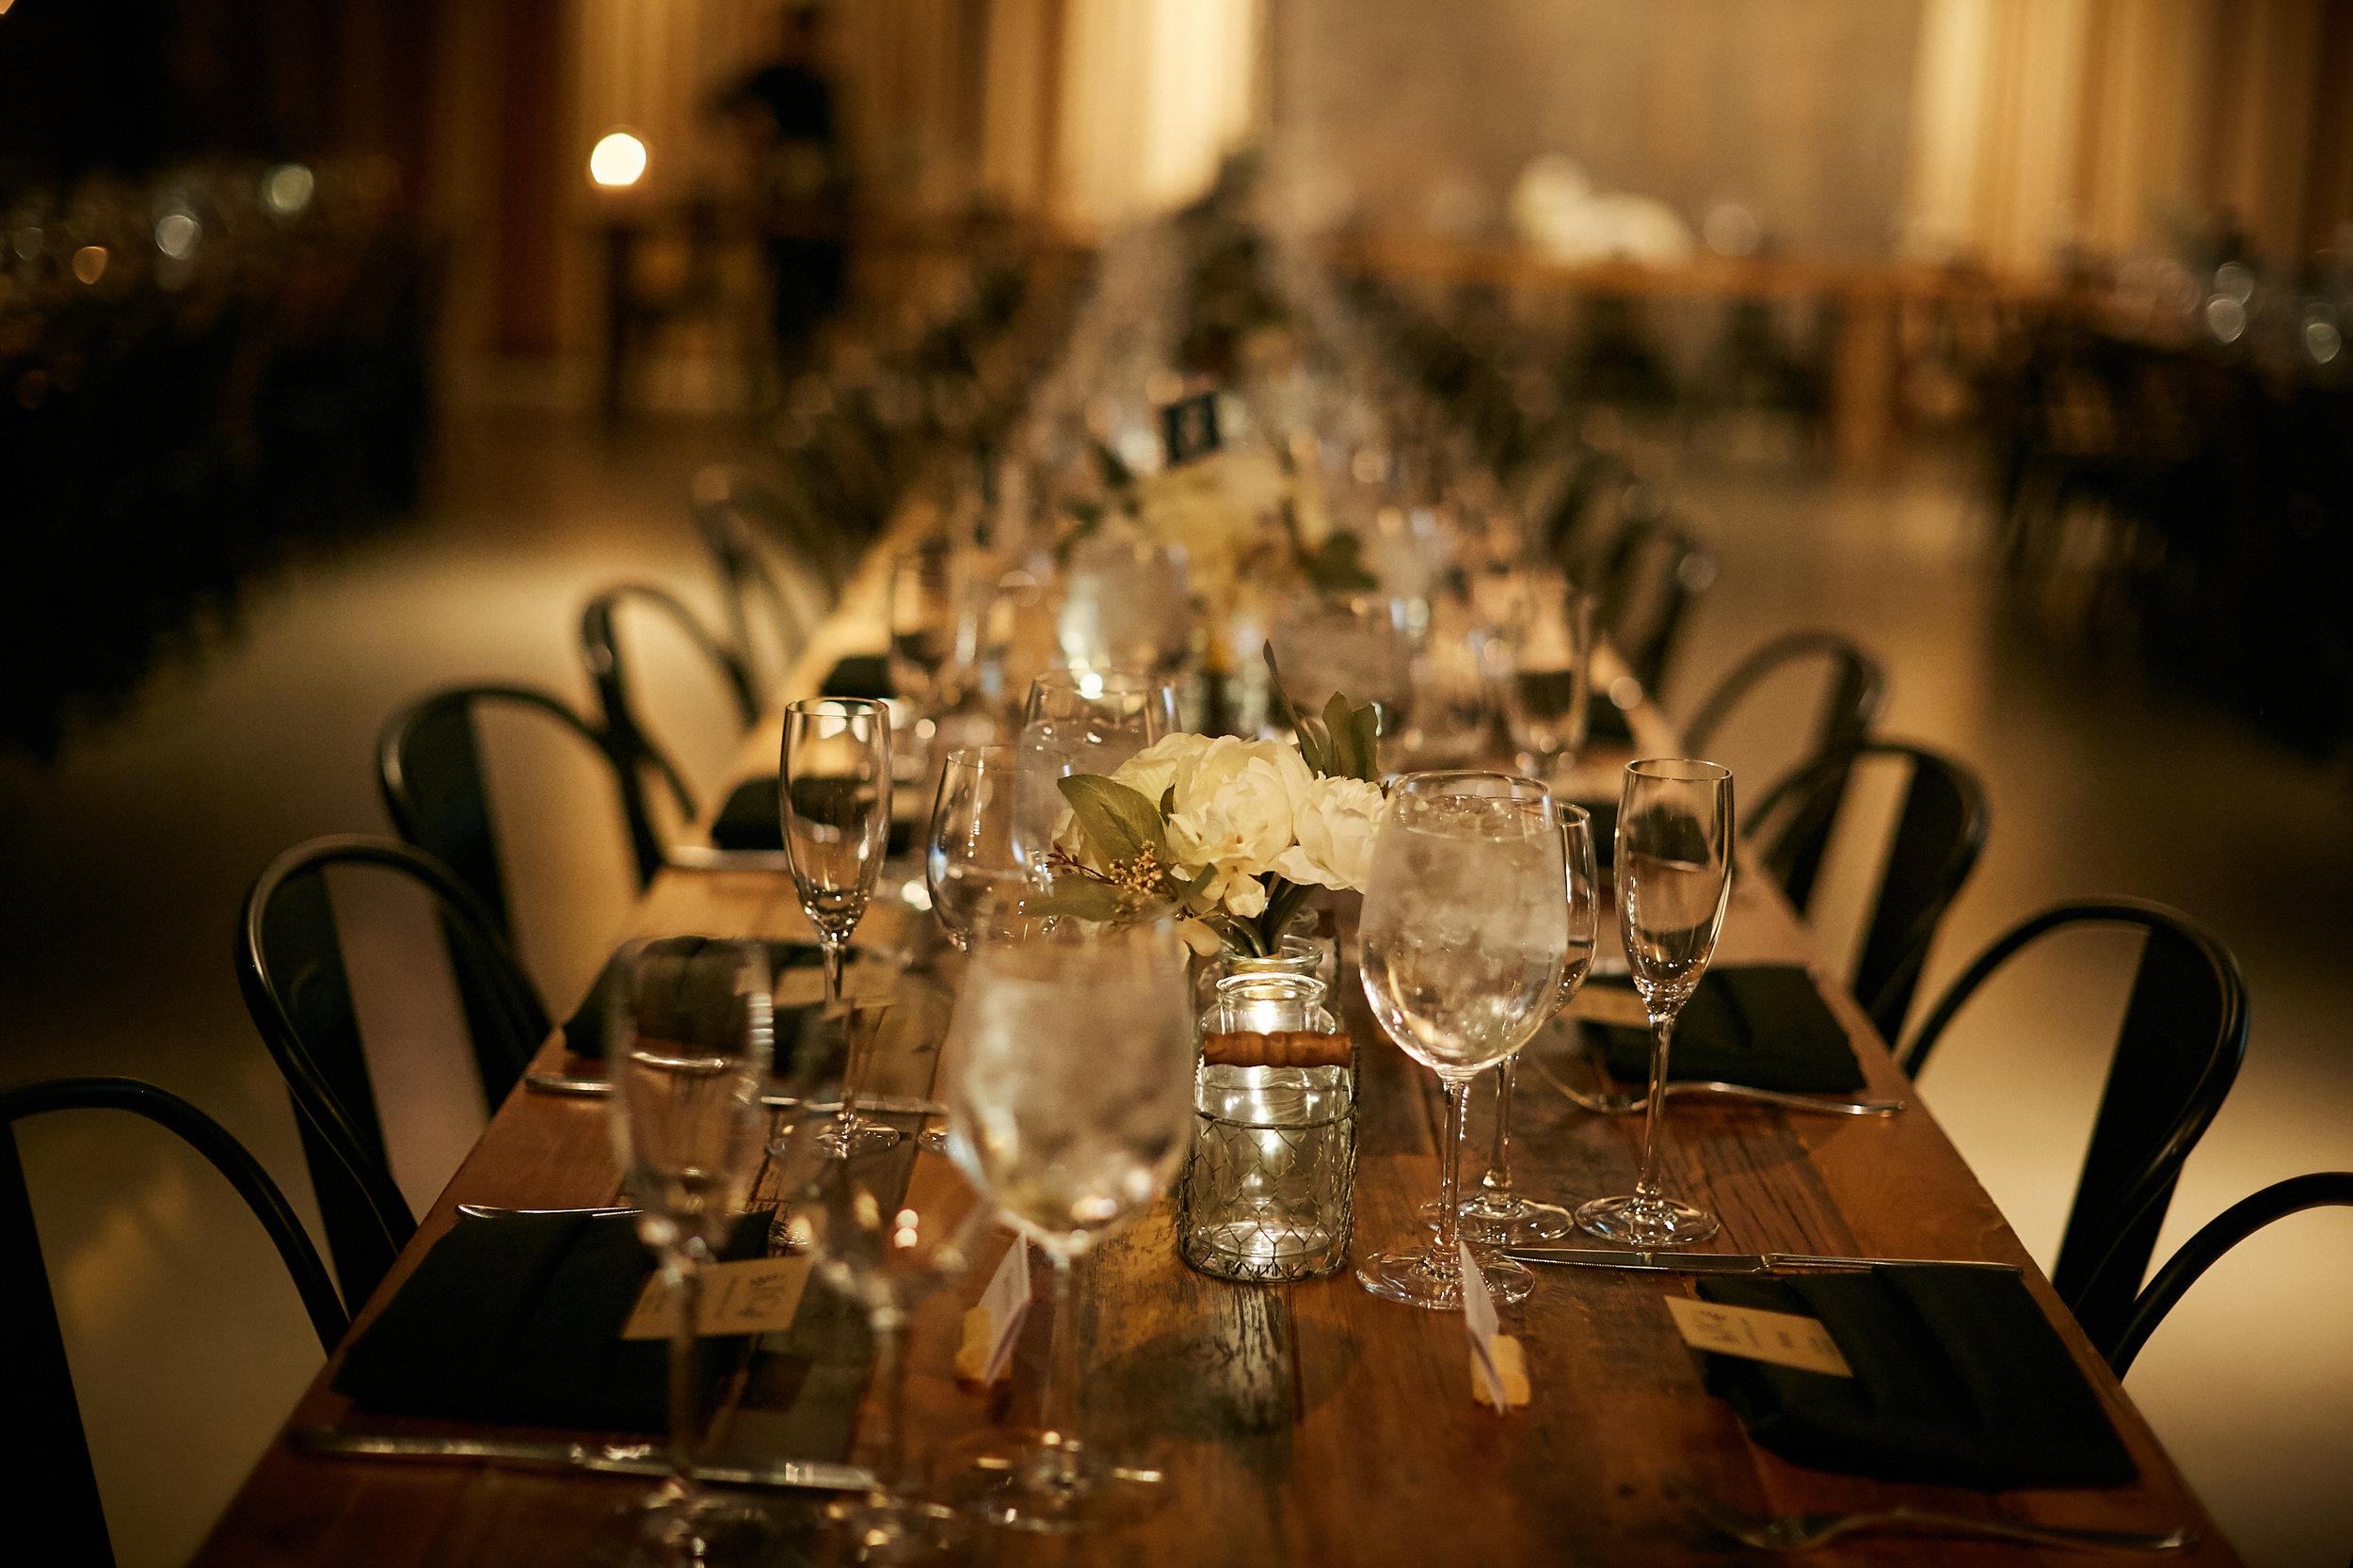 wedding reception table scape dinner guest venue